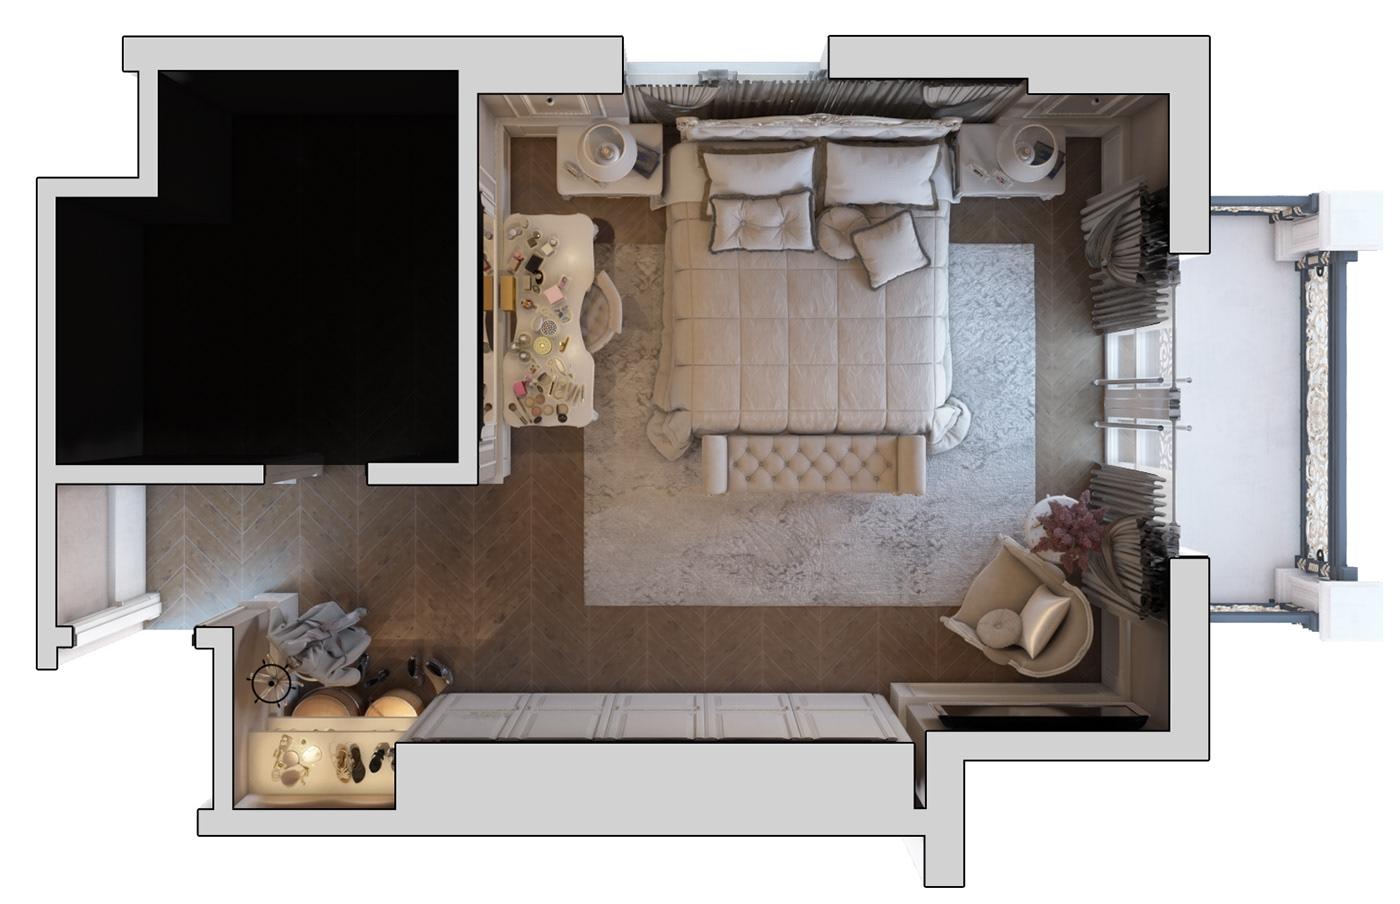 architecture interior design  graphics visualization design Interior 3dsmax vray photoshop Motaz mostafa